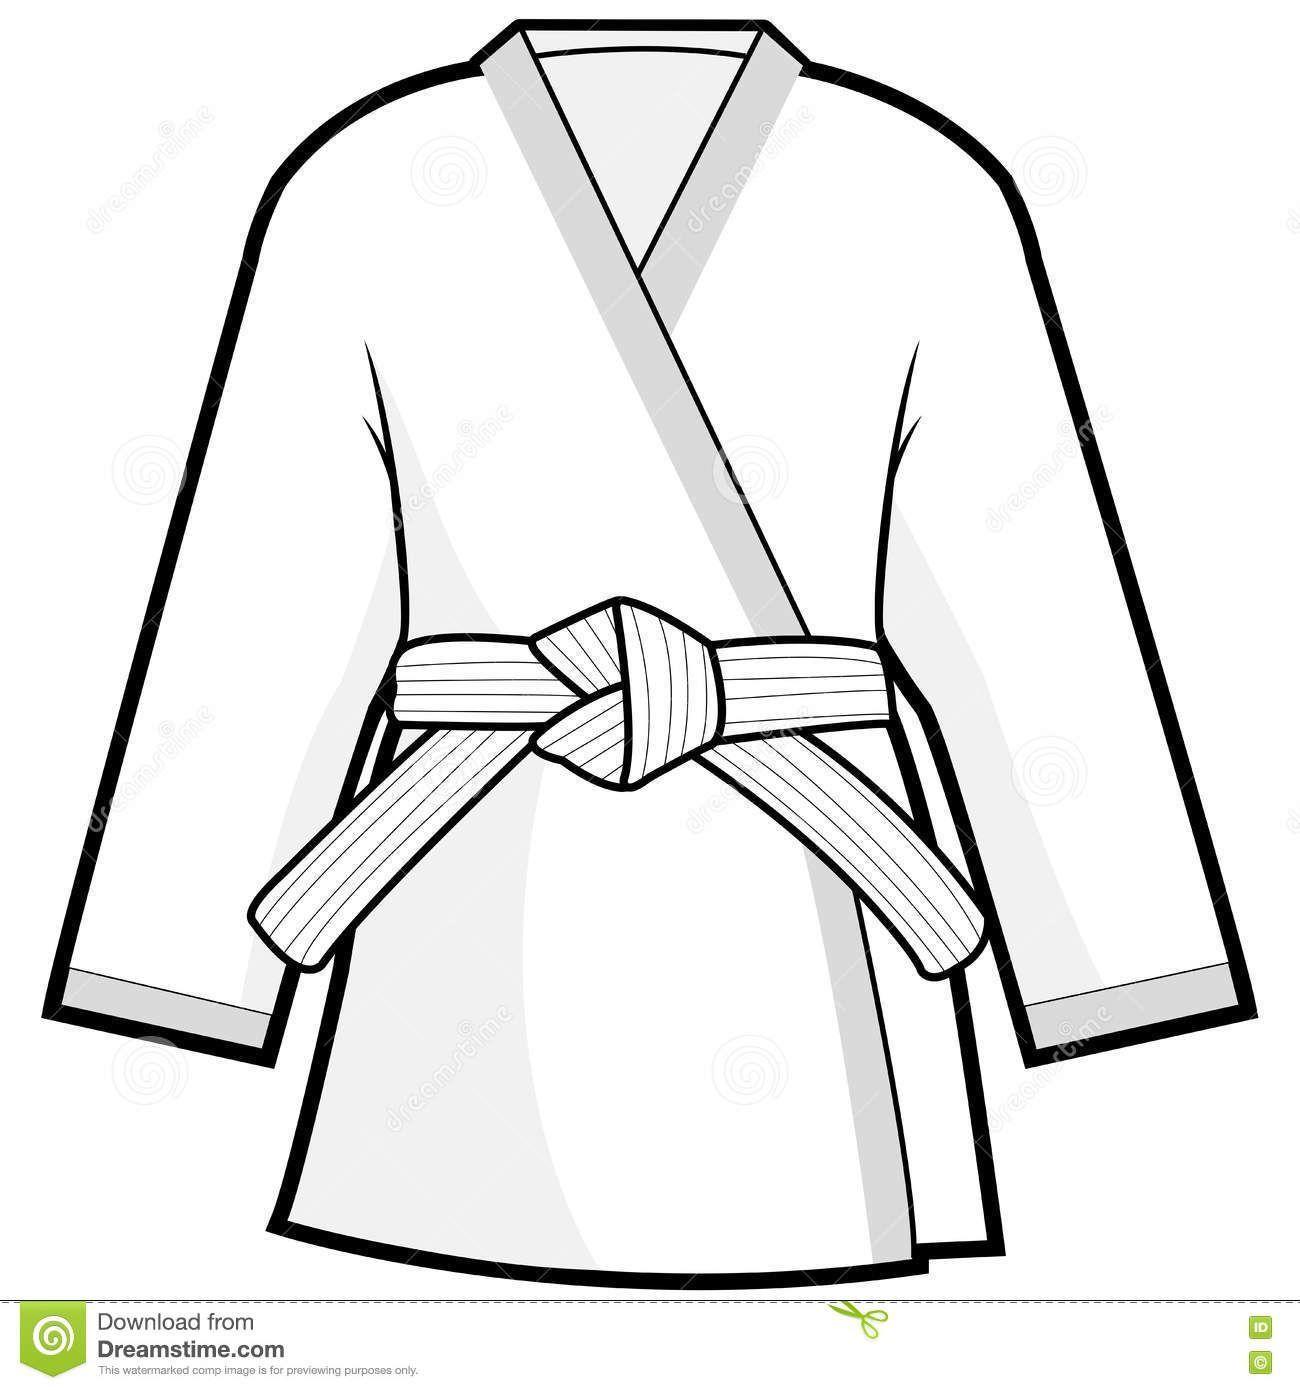 Karate gi clipart 5 » Clipart Portal.